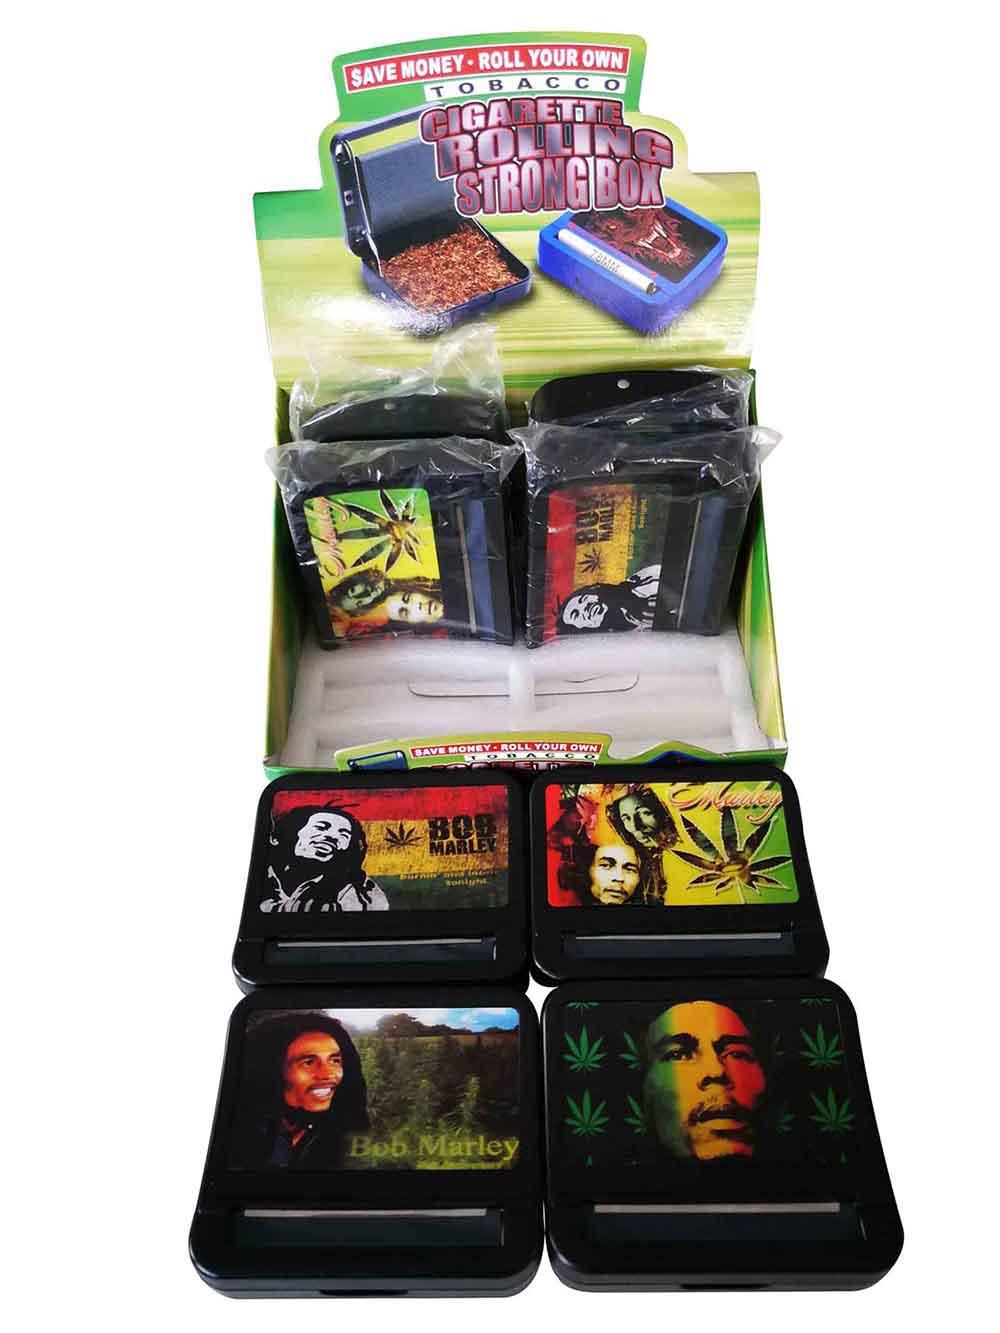 Cigarette Rolling Machine - Bob Marley